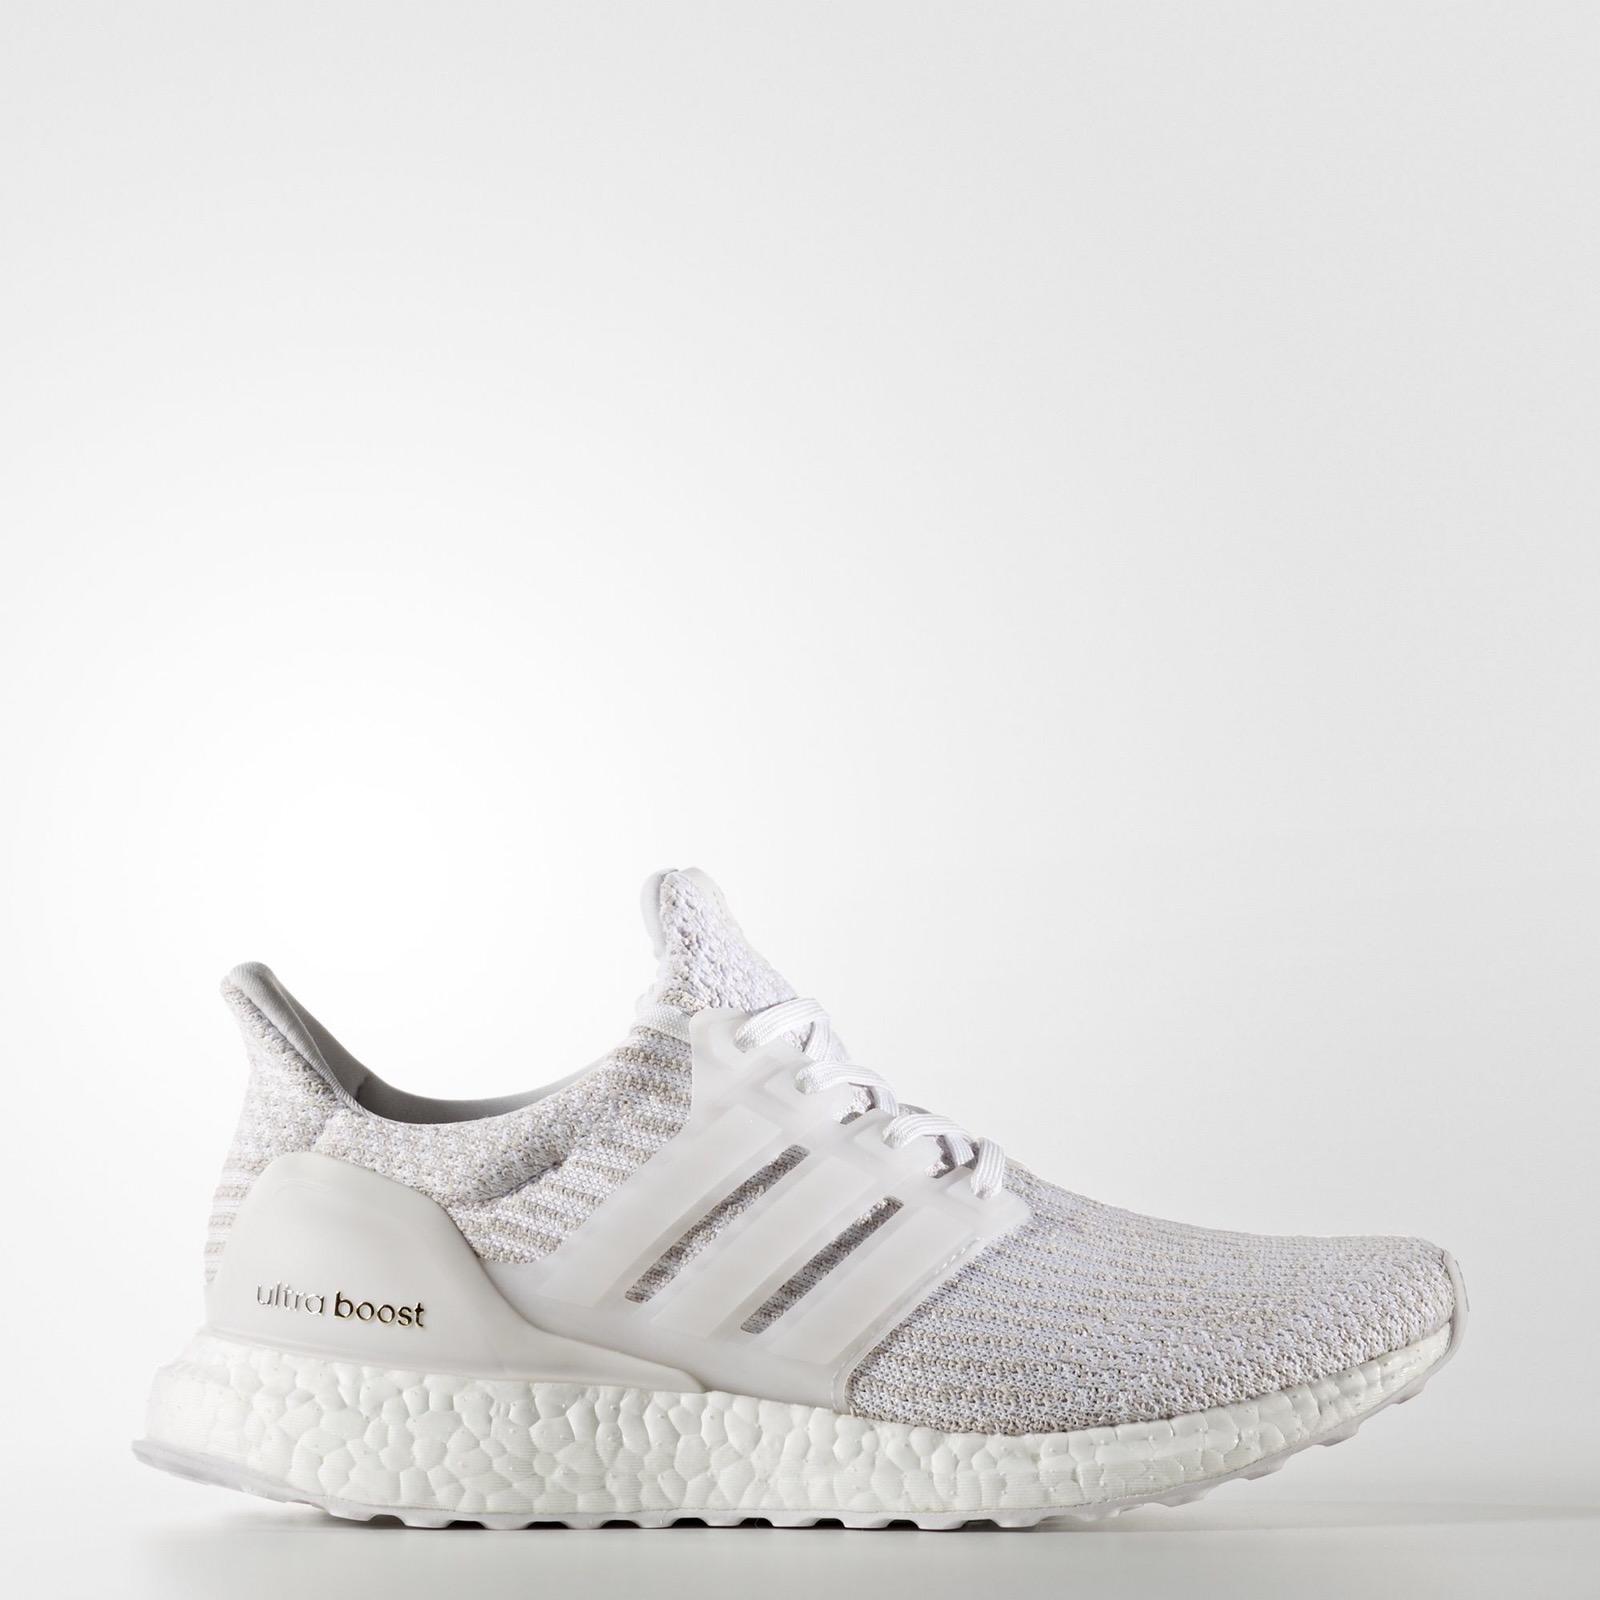 Moderne Adidas Ultra Boost 3.0 Grey White (hurricane Boosts) | Grailed SJ-87